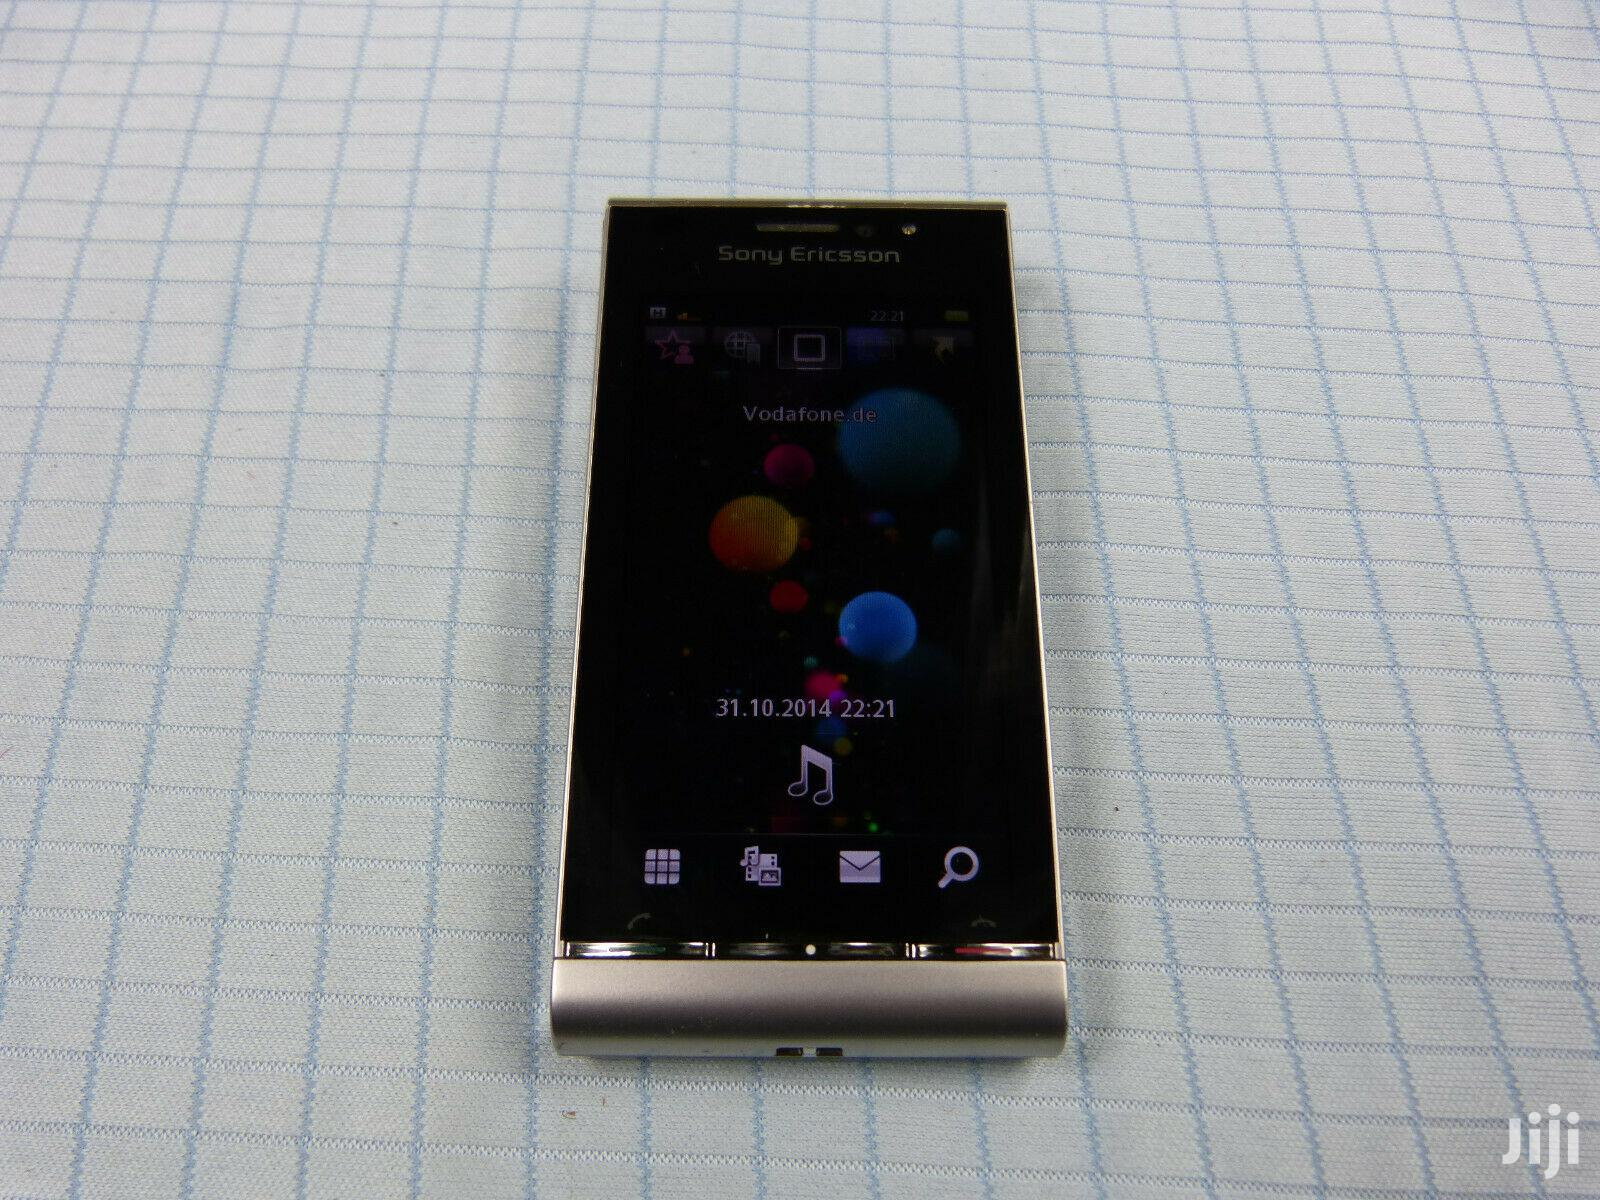 Sony Ericsson Satio (Idou) Black | Mobile Phones for sale in Accra Metropolitan, Greater Accra, Ghana